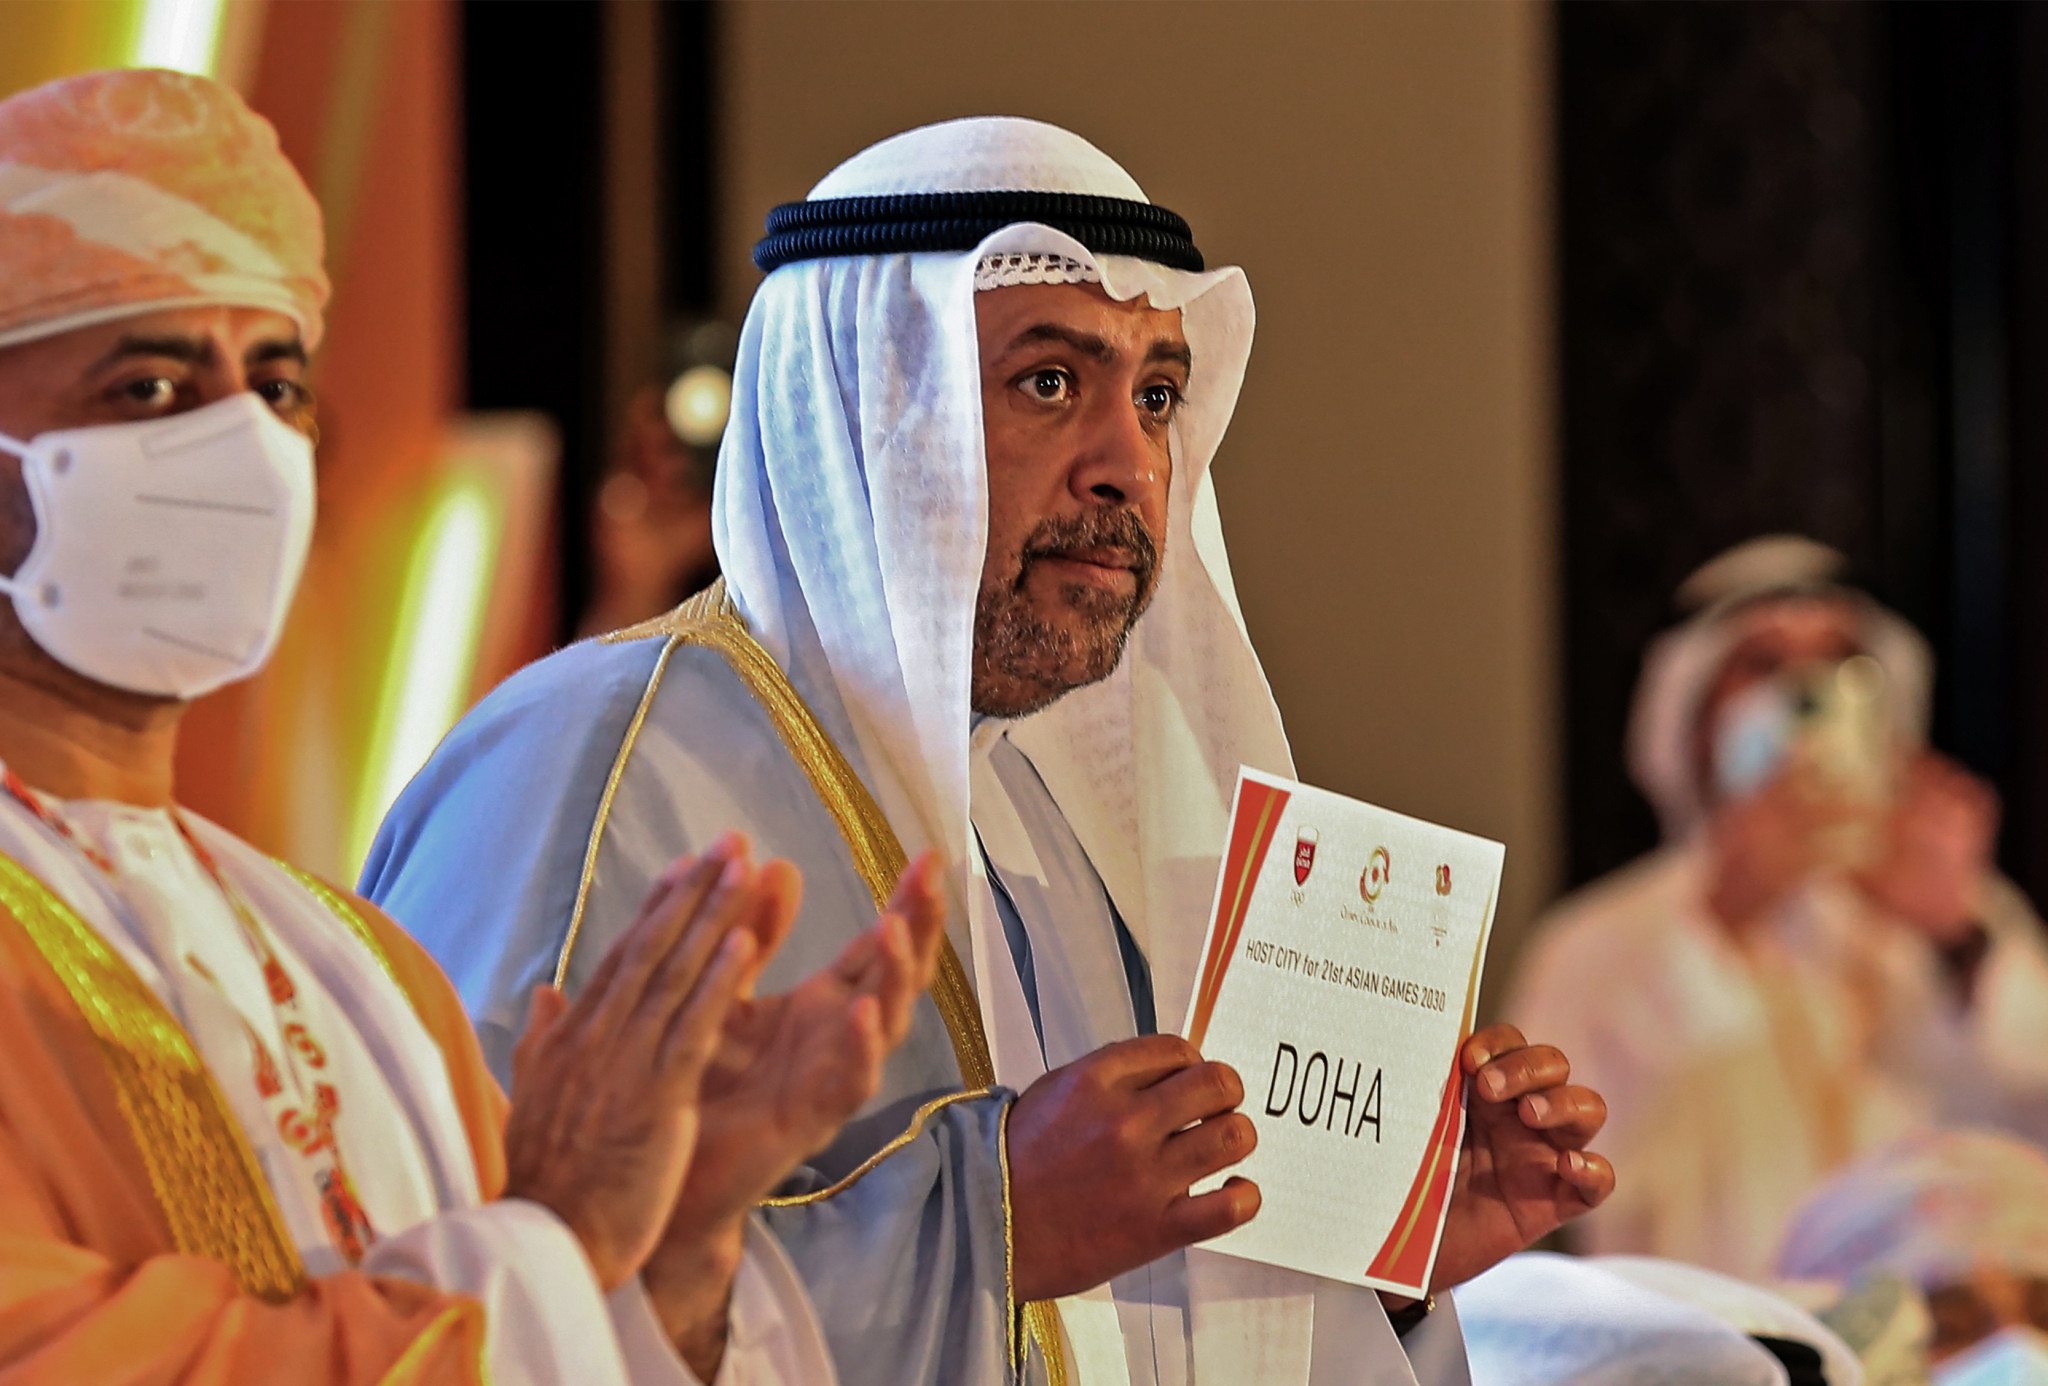 Doha will host the 2030 Asian Games with Riyadh awarded the 2034 edition ©OCA